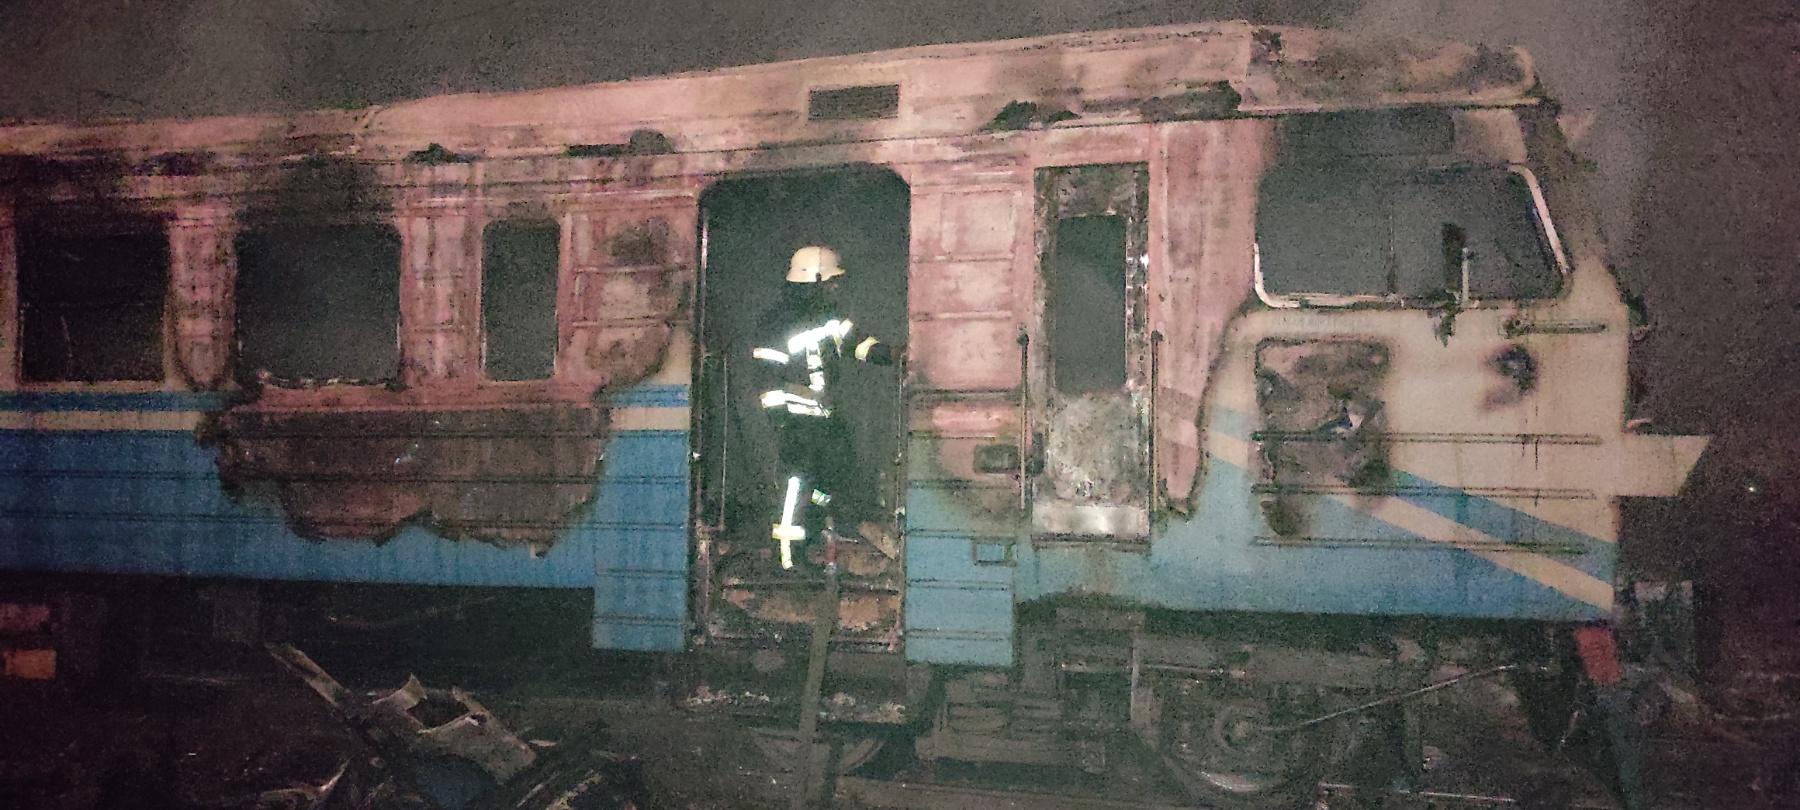 Яготин: пожежні загасили палаючий електропотяг (відео) - загорання, електрички - 0 02 05 2c3ebda73b839e459574d35308049537efec6ec06033028f2a075290469303c0 6ef0b73c